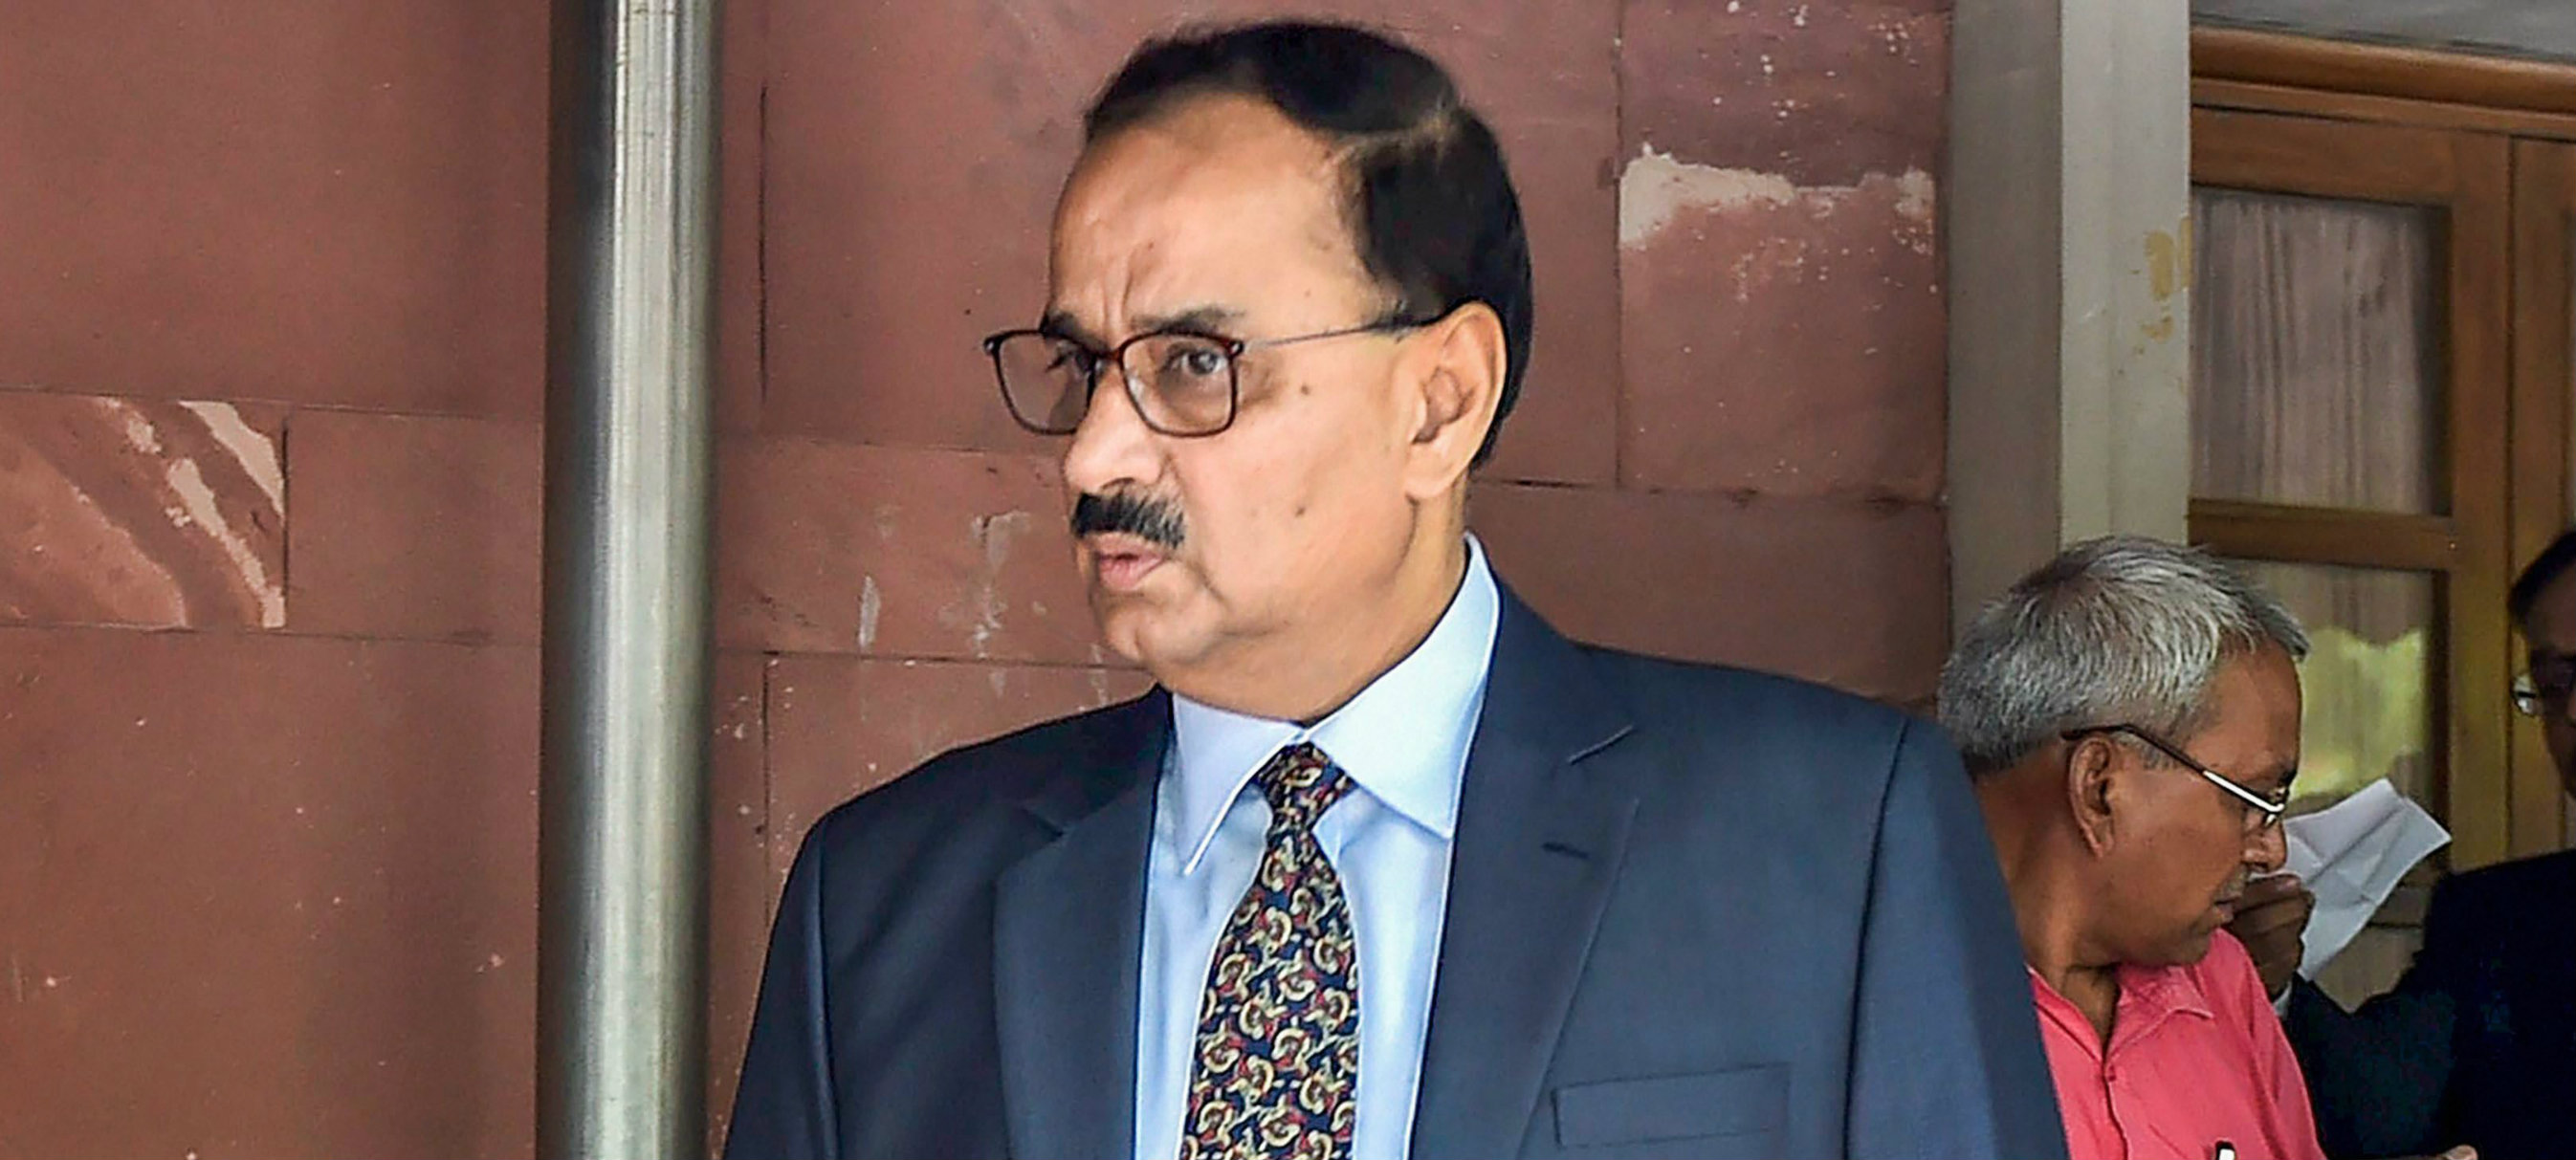 Blunder whiff in post govt chose in haste to shunt Alok Verma